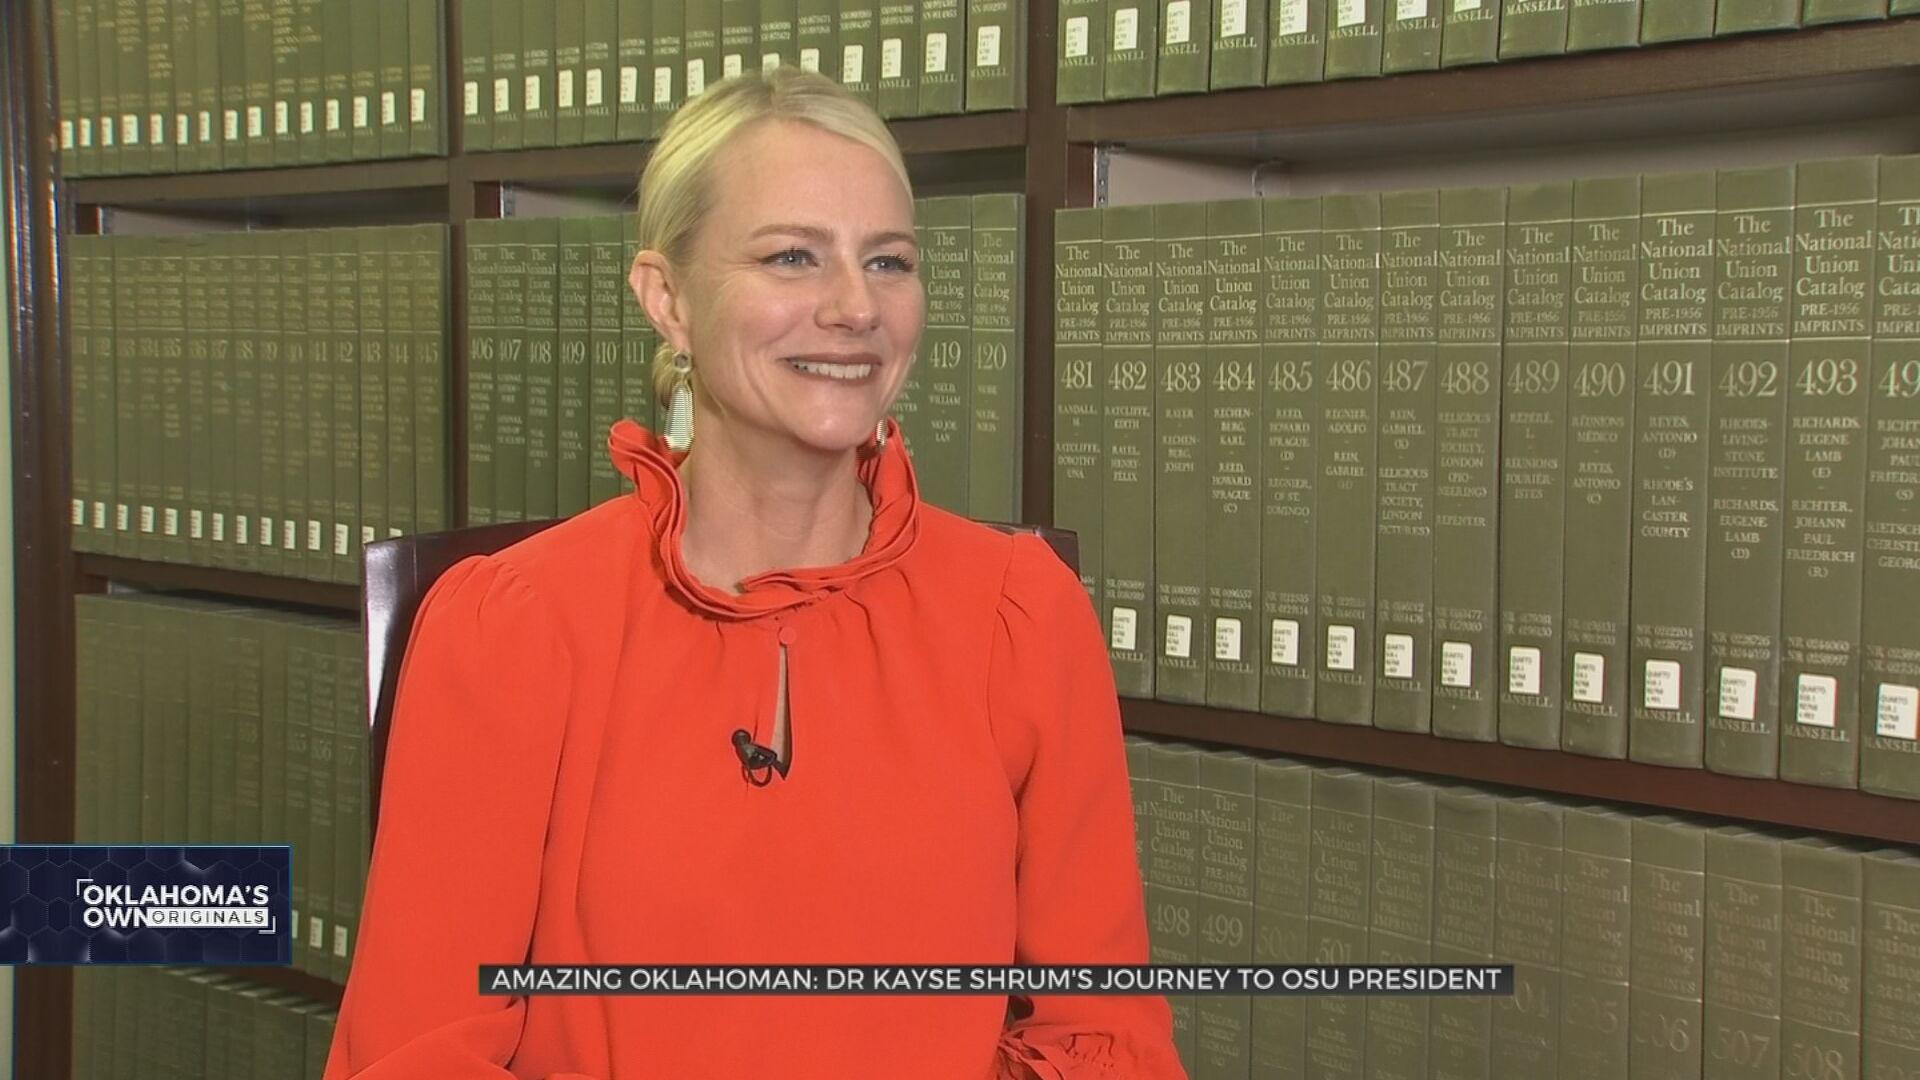 Amazing Oklahoman: Dr. Kayse Shrum's Journey To Become OSU's First Female President